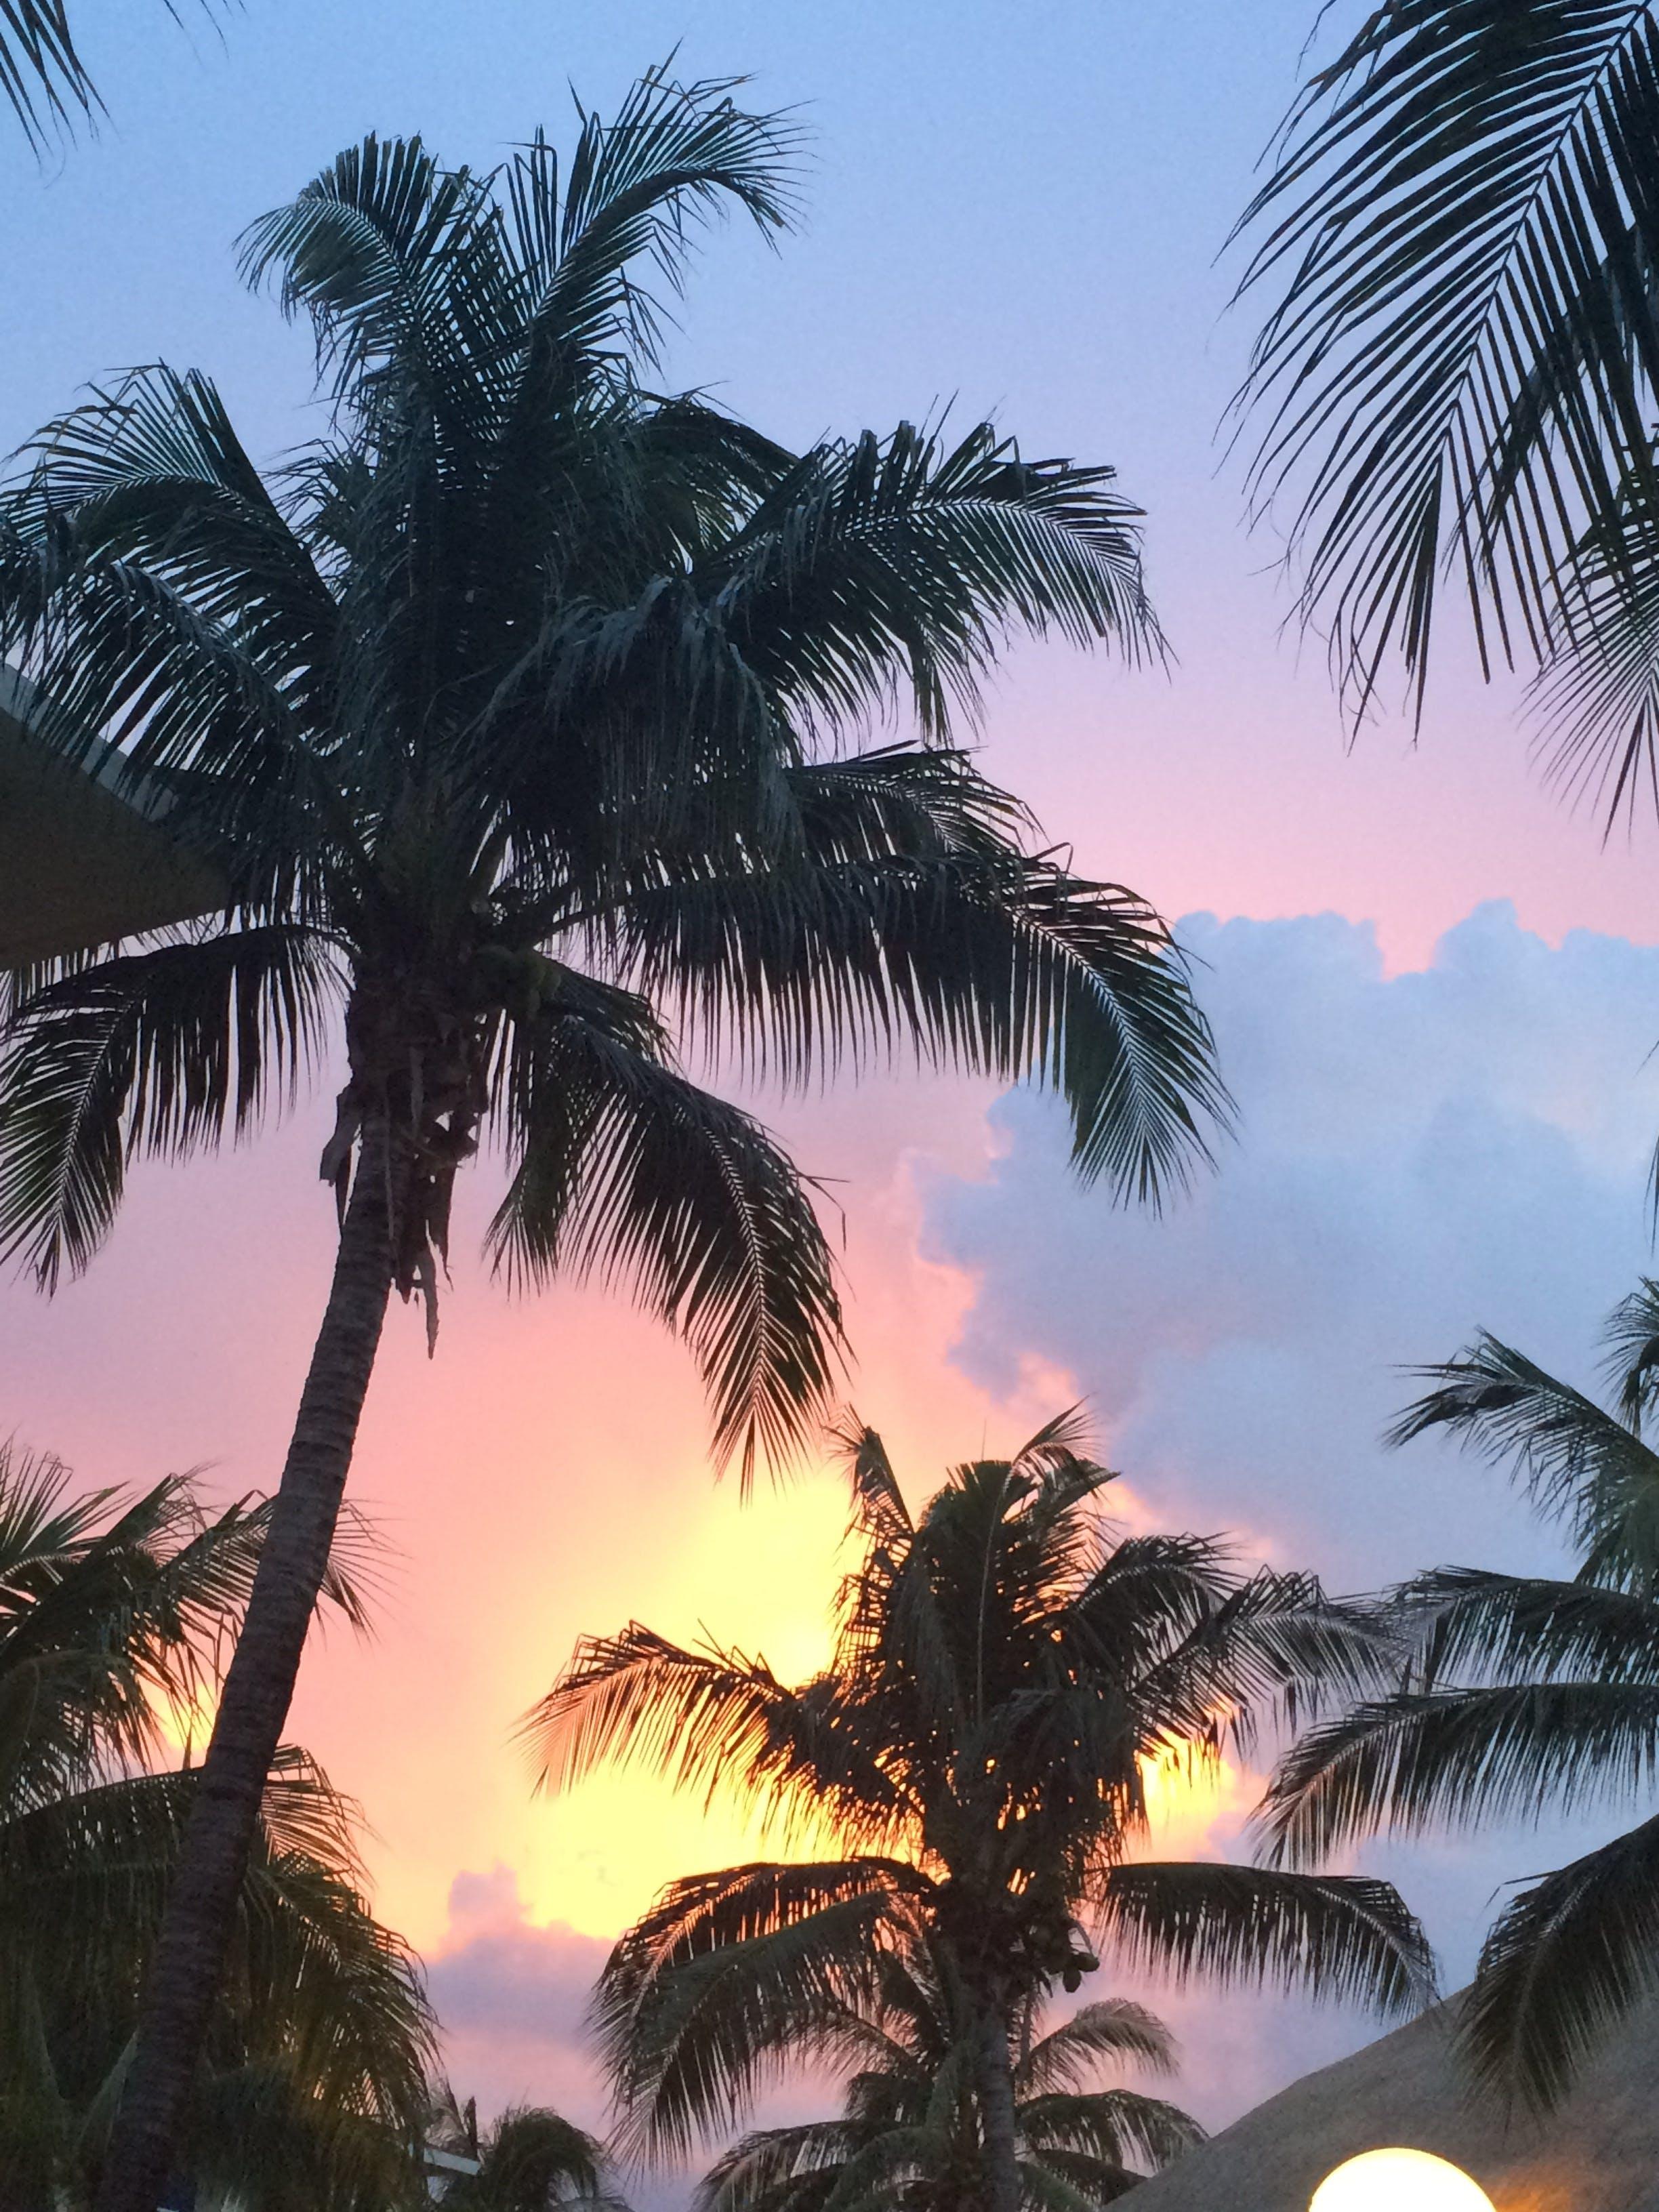 Kostenloses Stock Foto zu palme, sonnenuntergang, urlaub